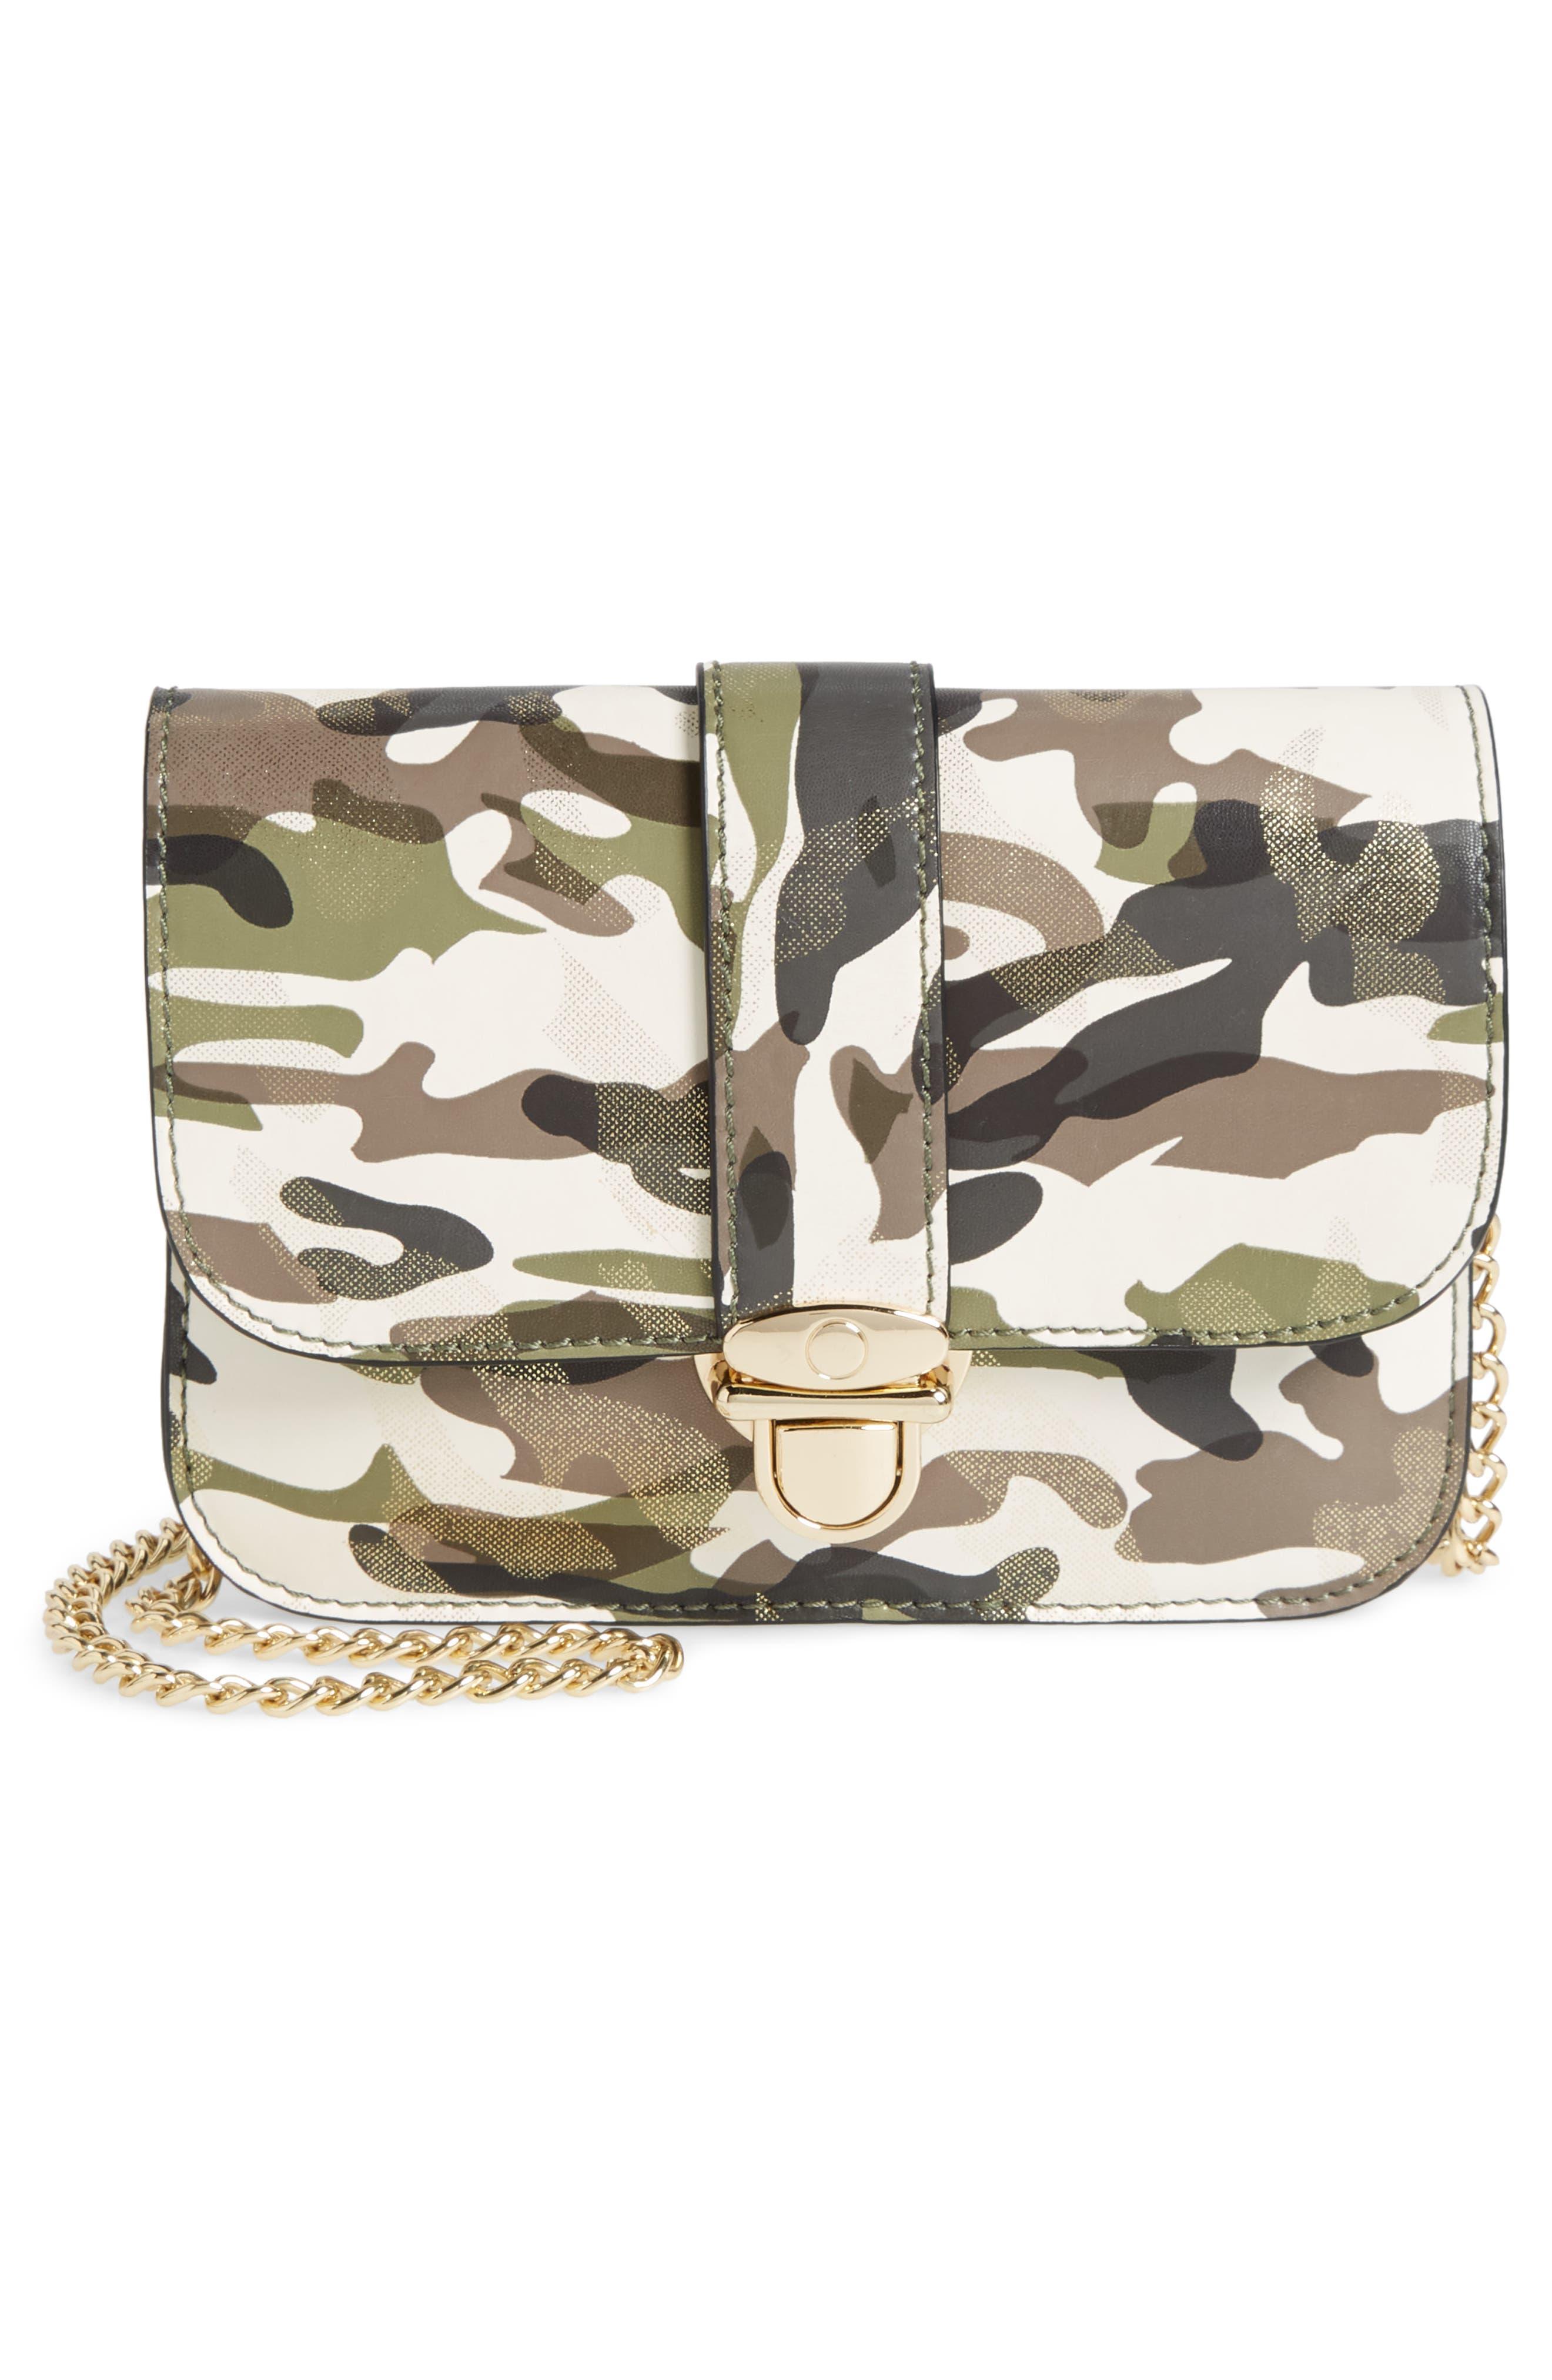 Mali + Lili Stella Camouflage Vegan Leather Crossbody Belt Bag,                             Alternate thumbnail 4, color,                             CAMOUFLAGE